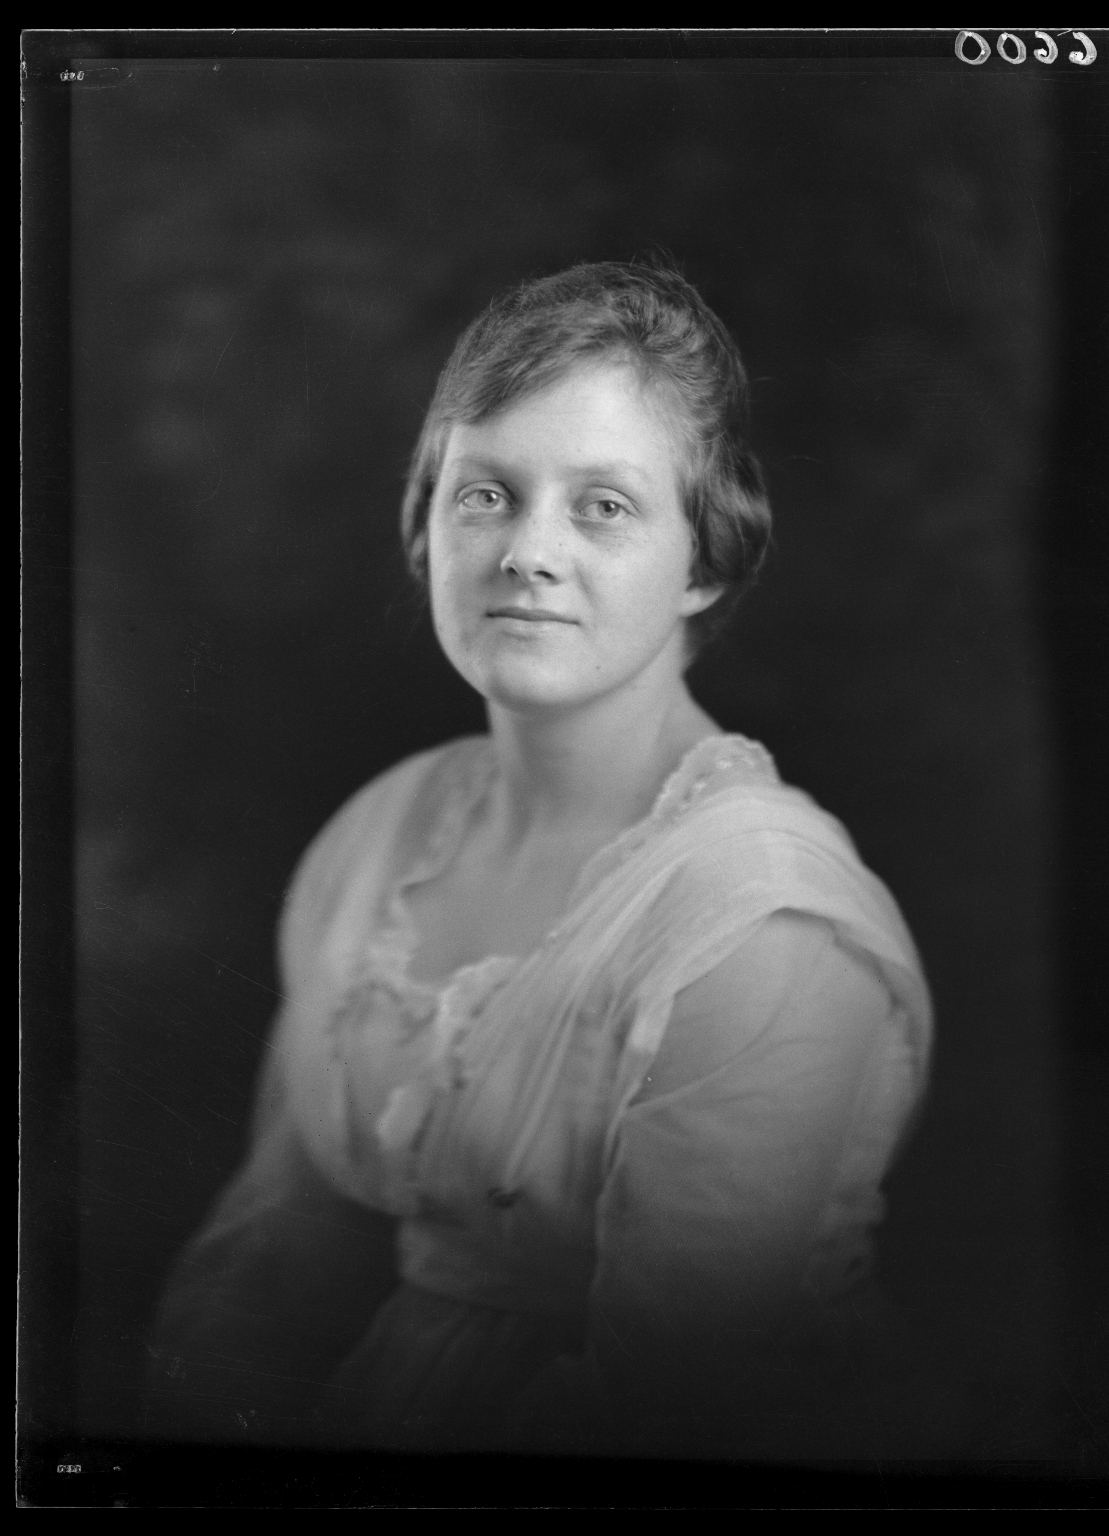 Portraits of Margaret Nelson